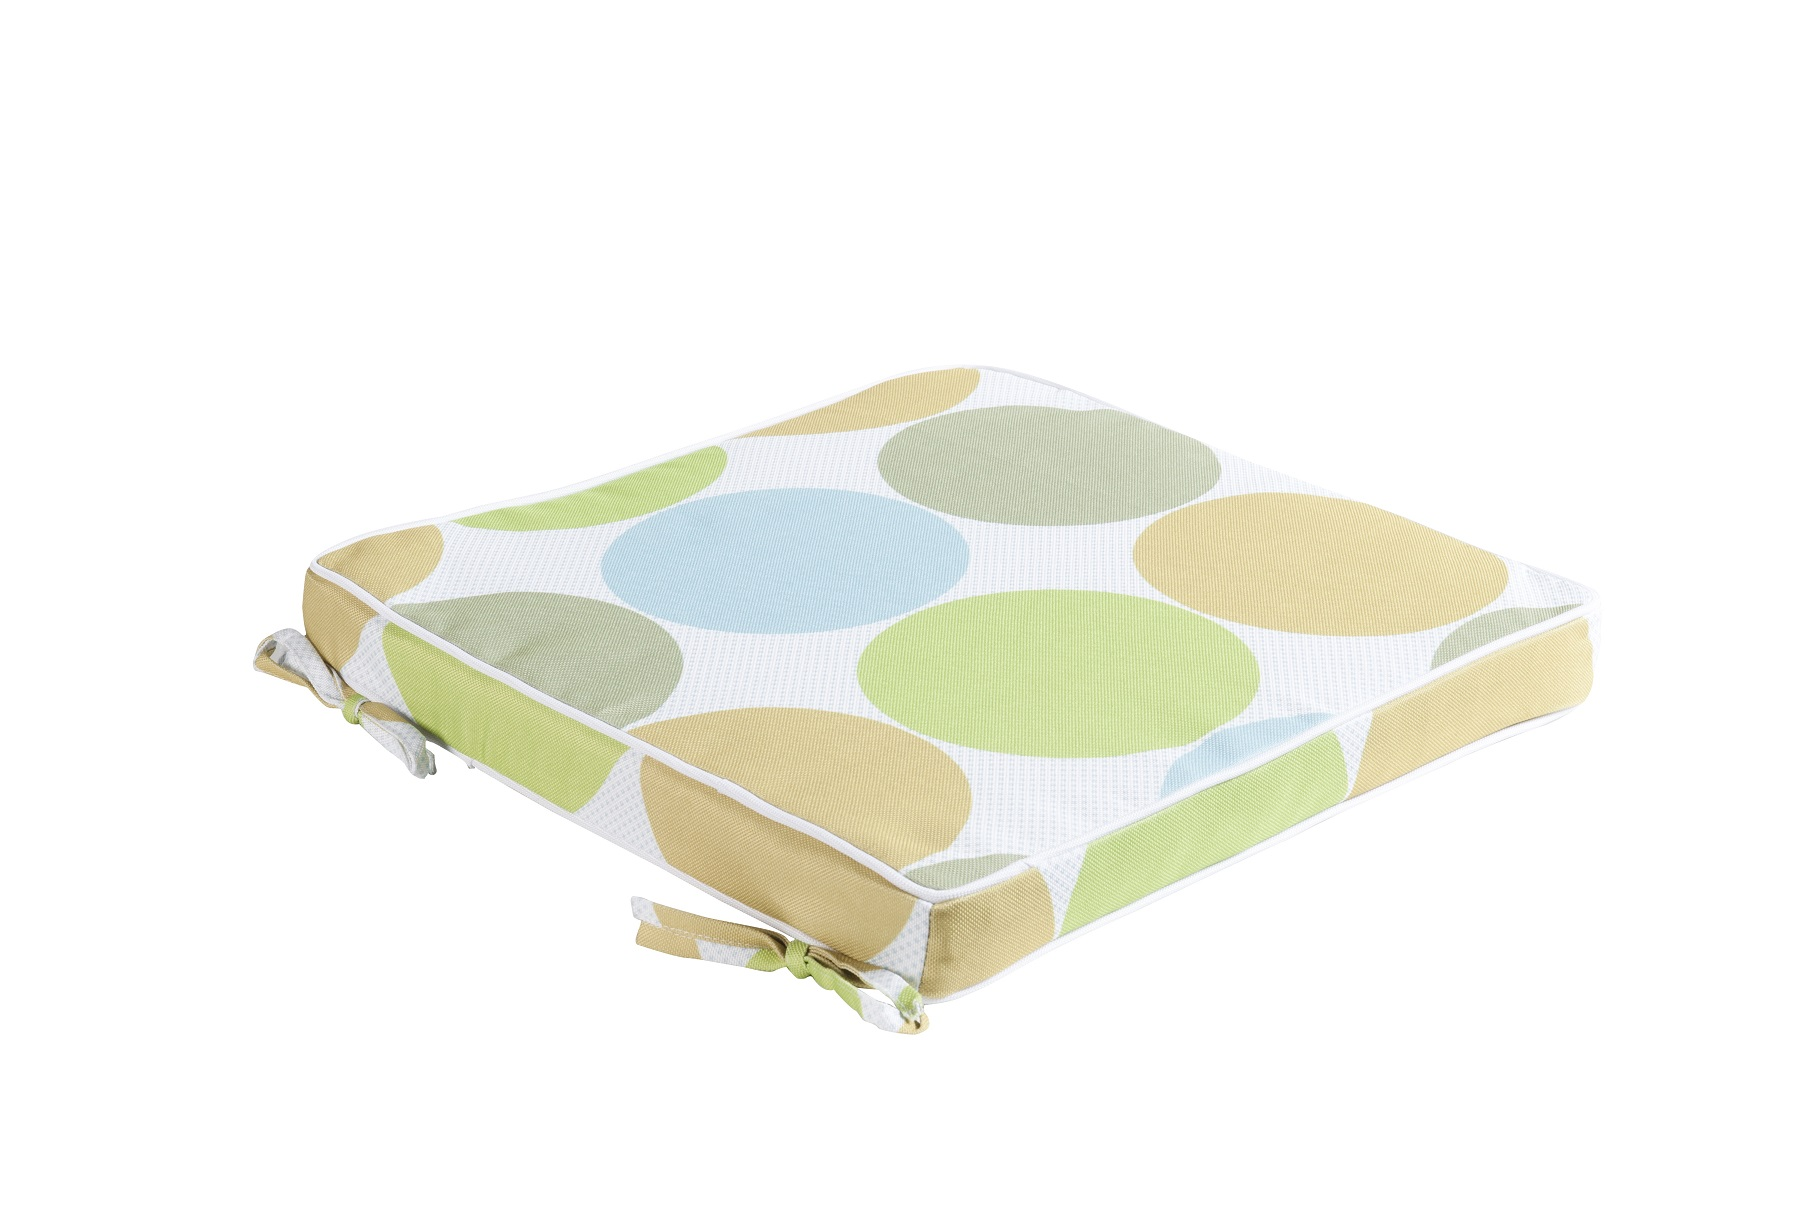 outdoor sitzkissen 40cm x 40cm nandine blau gr n polster stuhlauflage. Black Bedroom Furniture Sets. Home Design Ideas